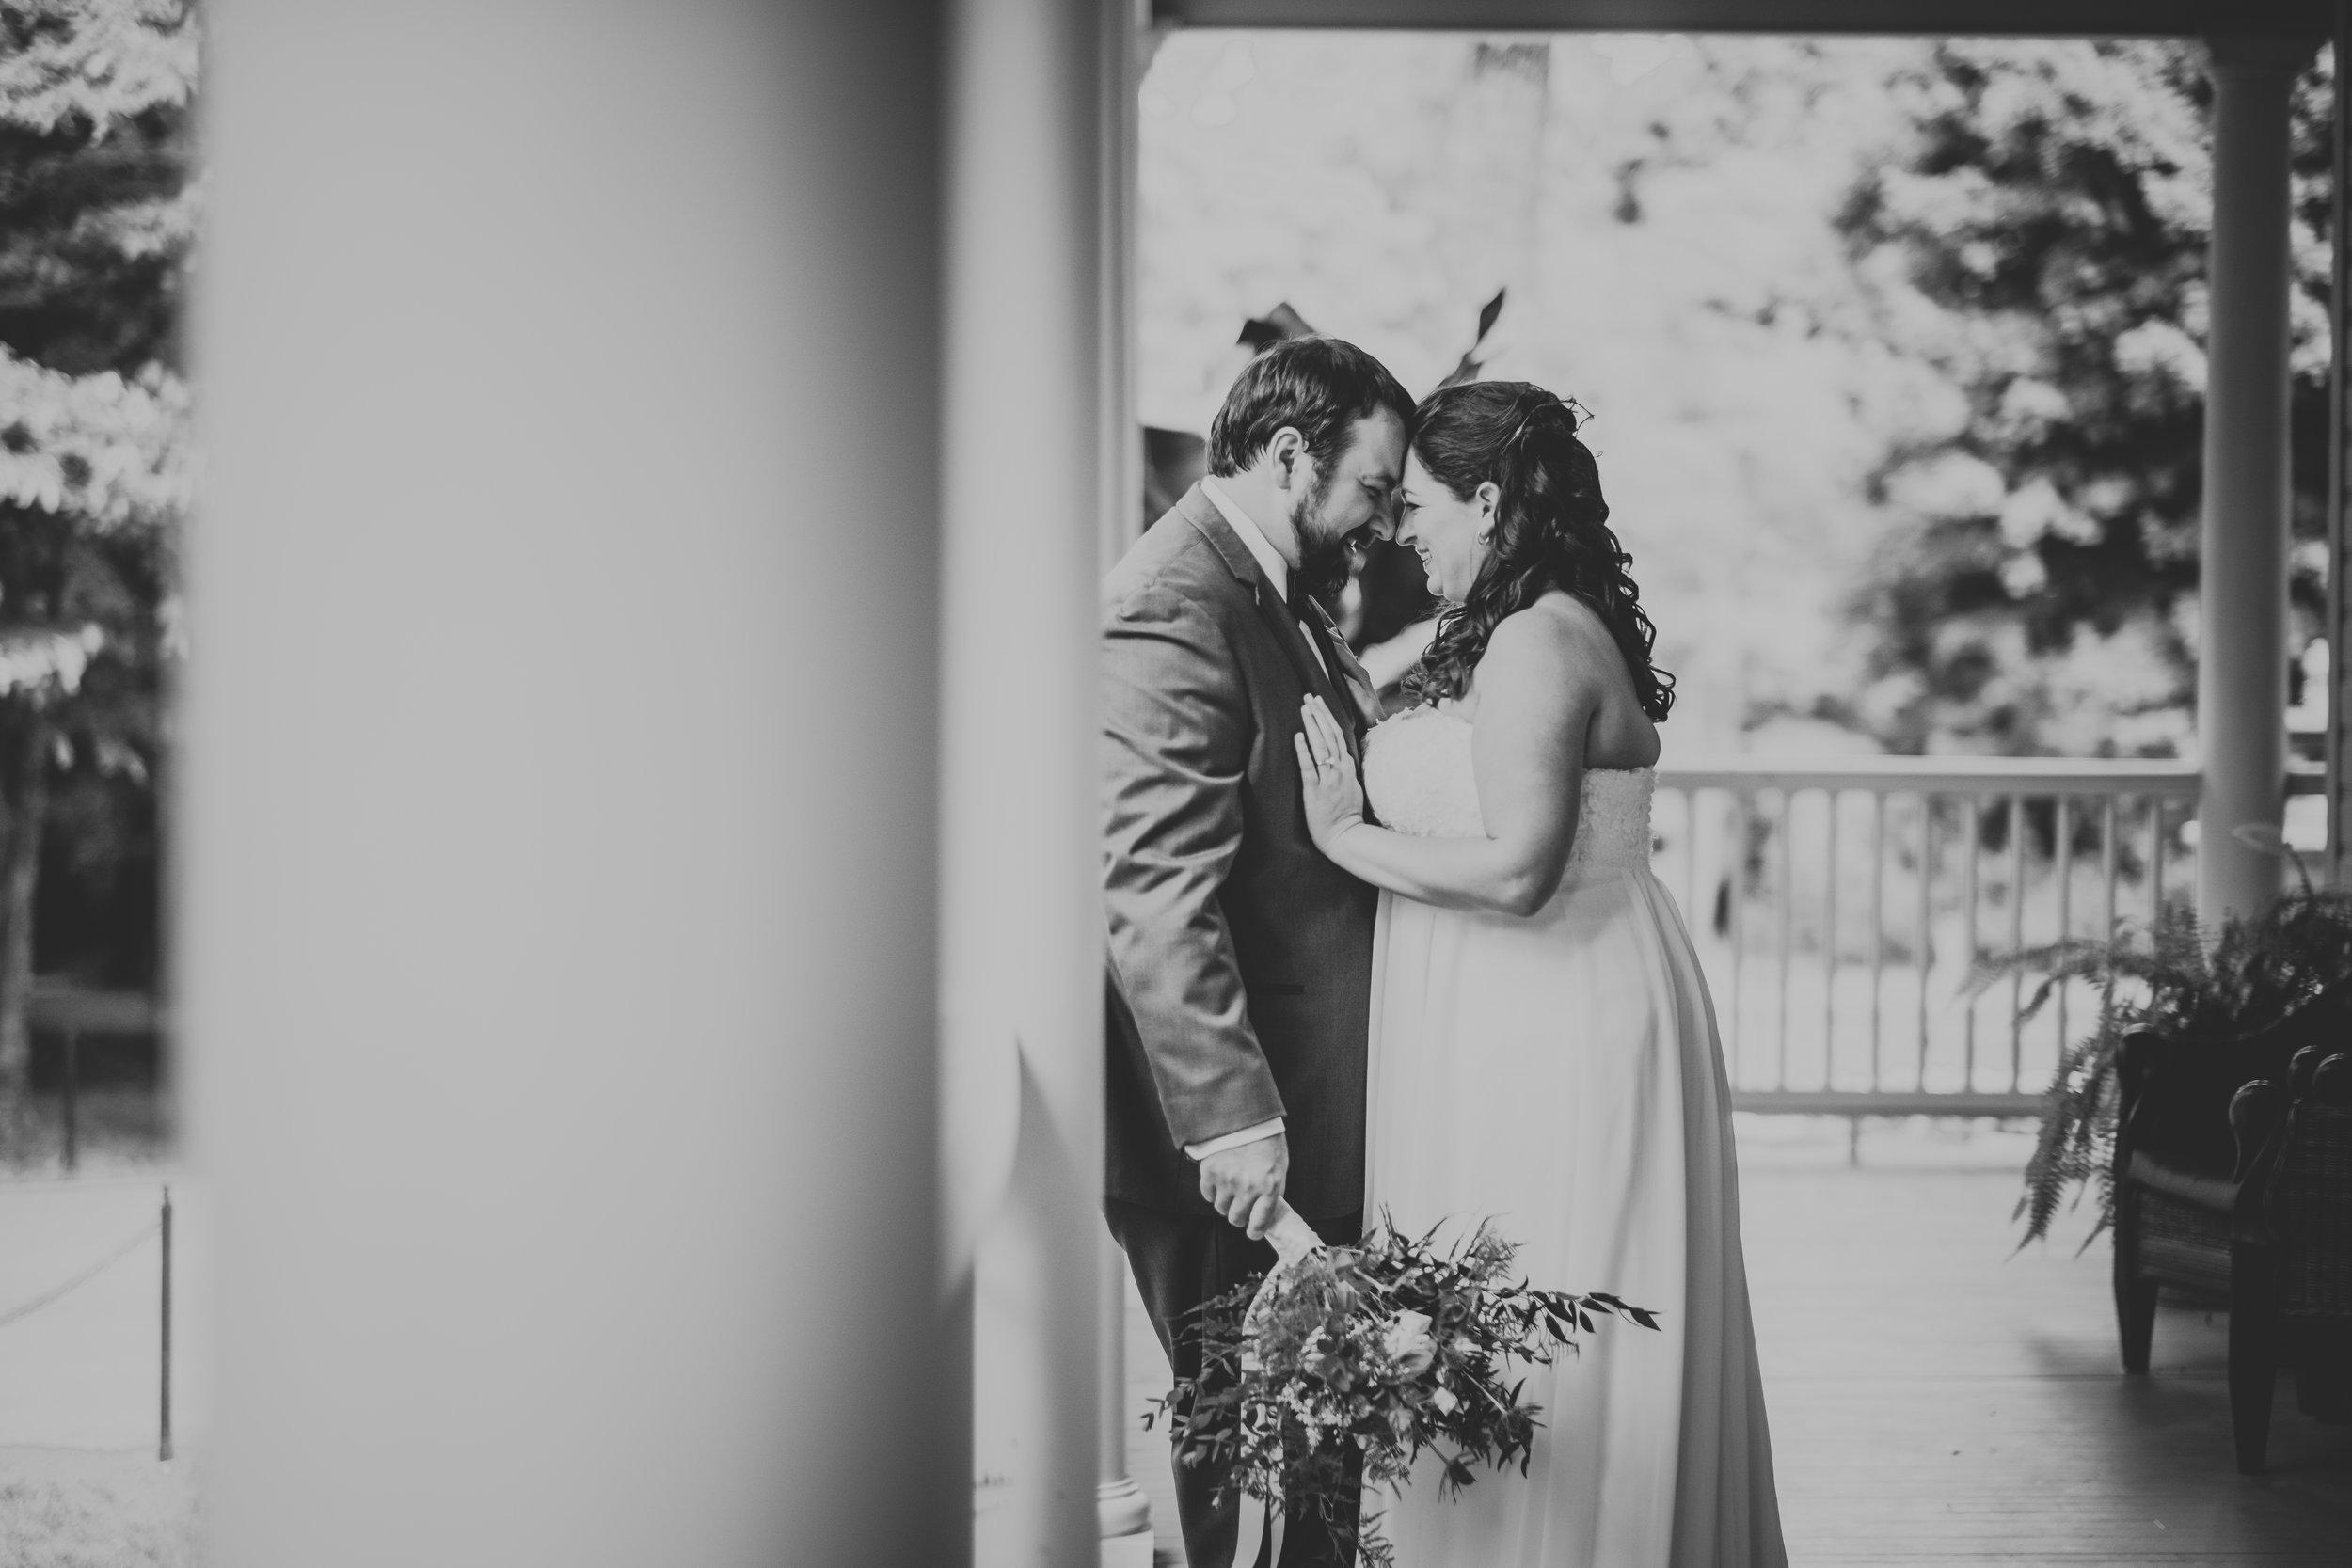 Ashley.Eric.Wedding.Delyn.2016.Mileswittboyer.Photographiccollective-253.jpg